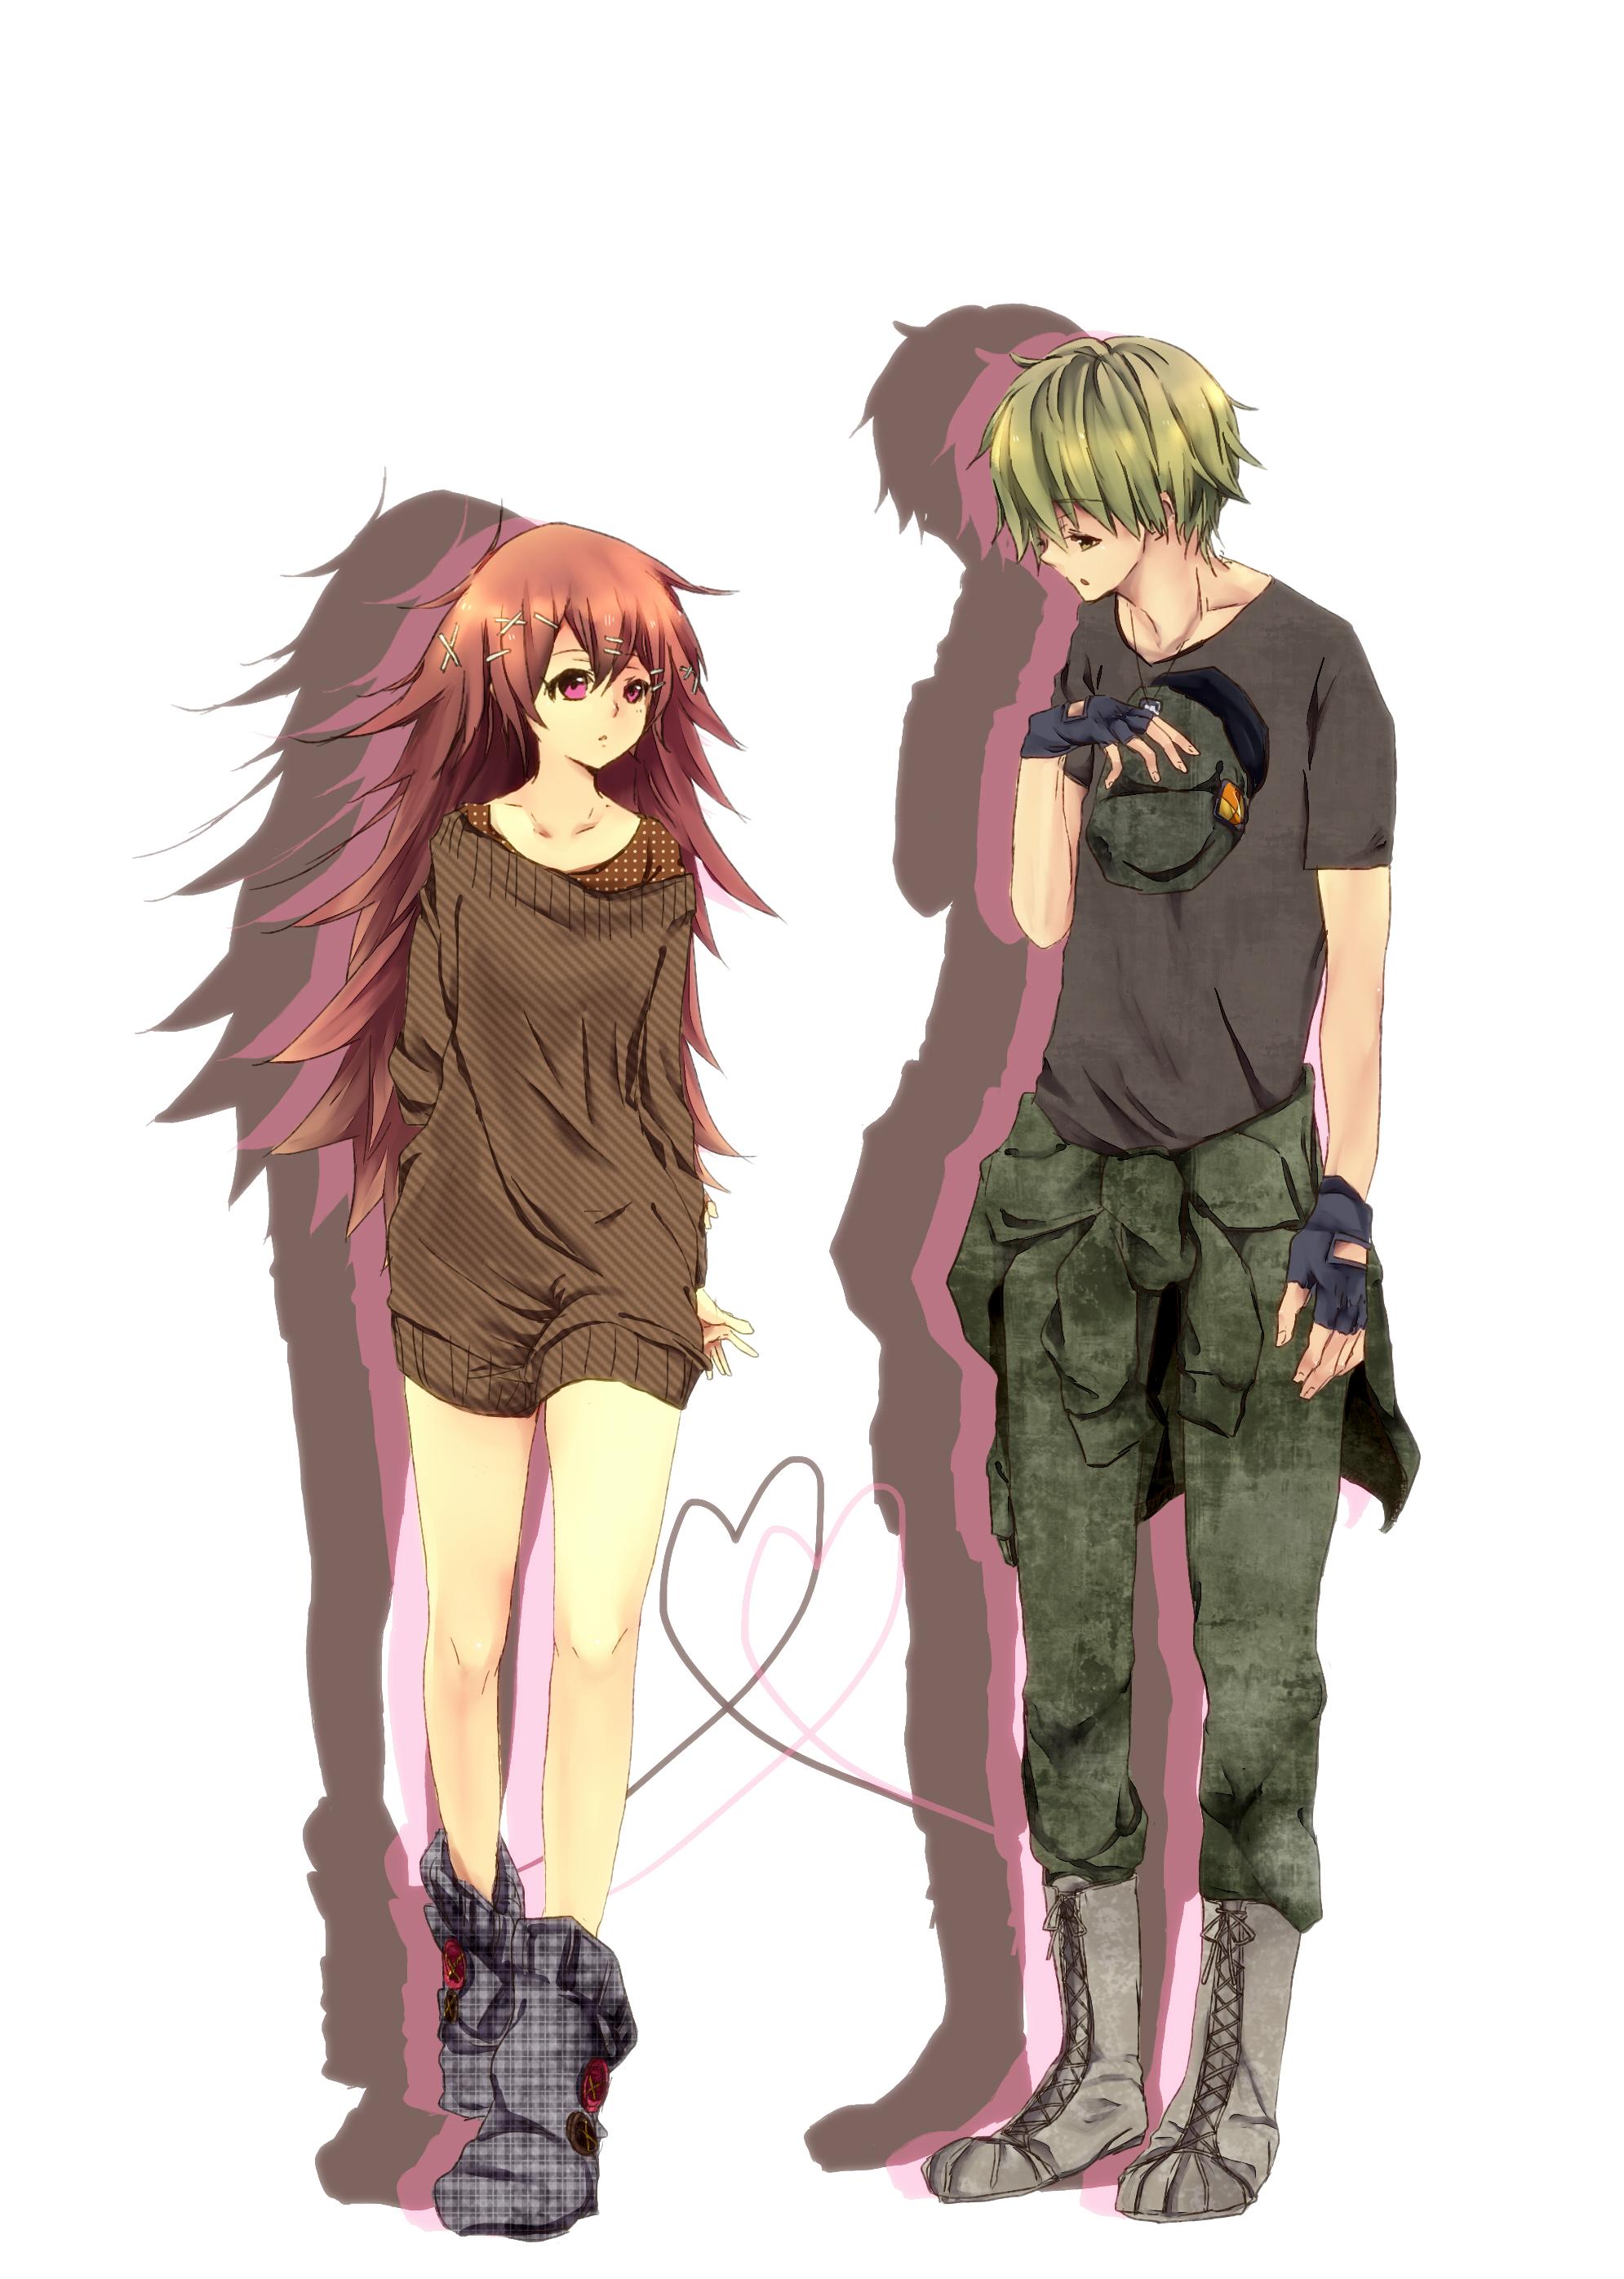 Couple cute anime girl blonde hair for Zerochan anime